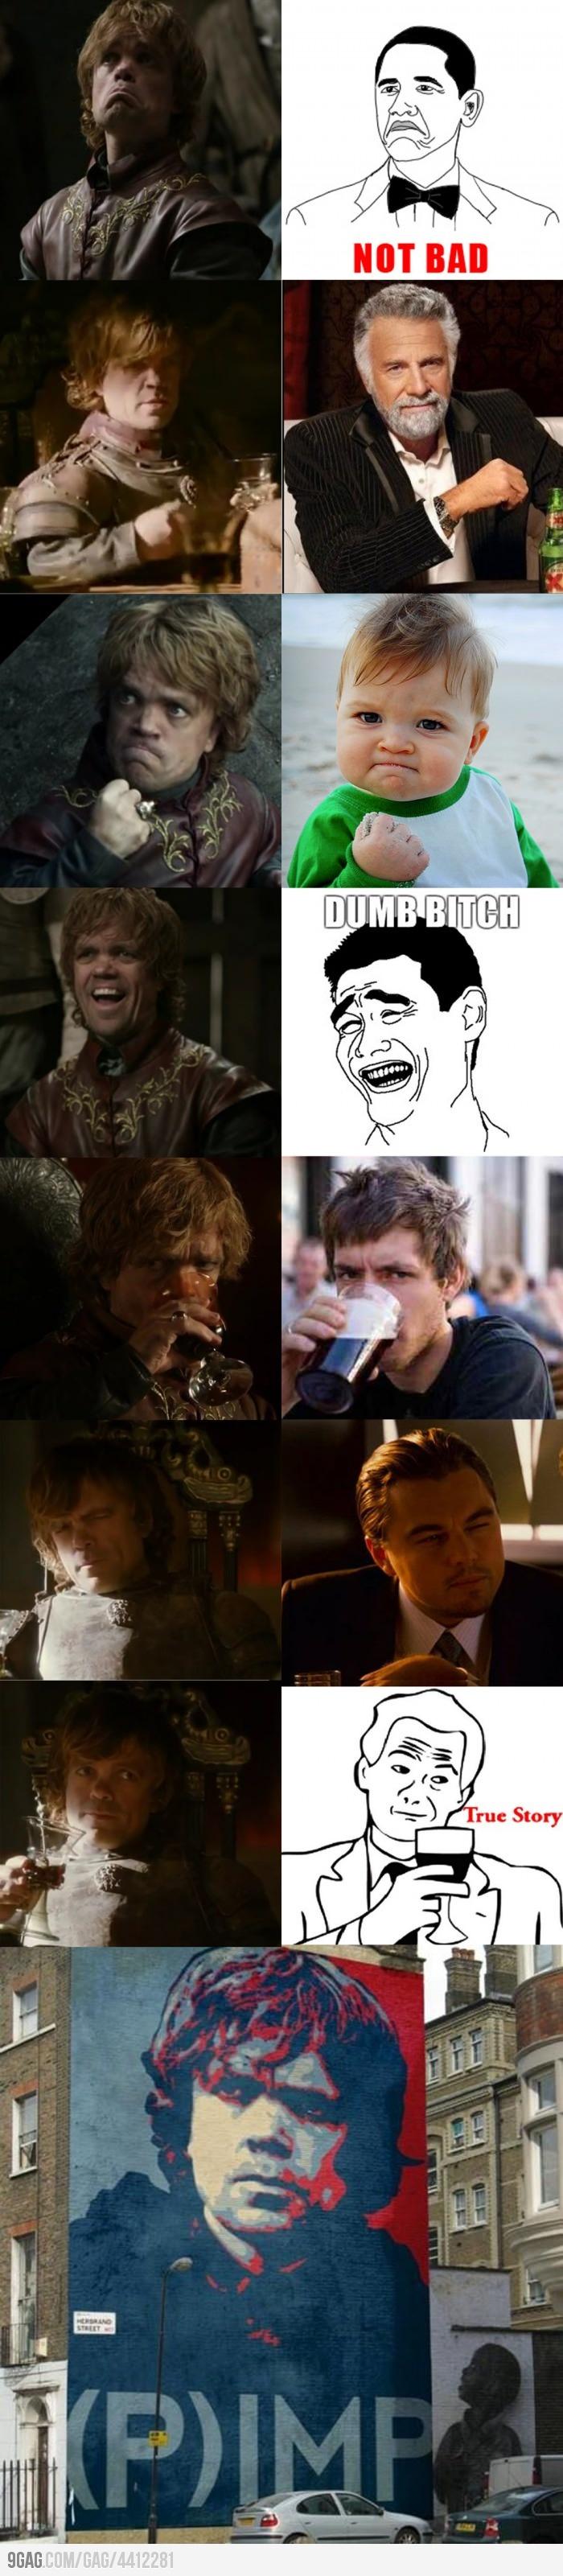 Half-meme #Tyrion #lannister #gameofthrones